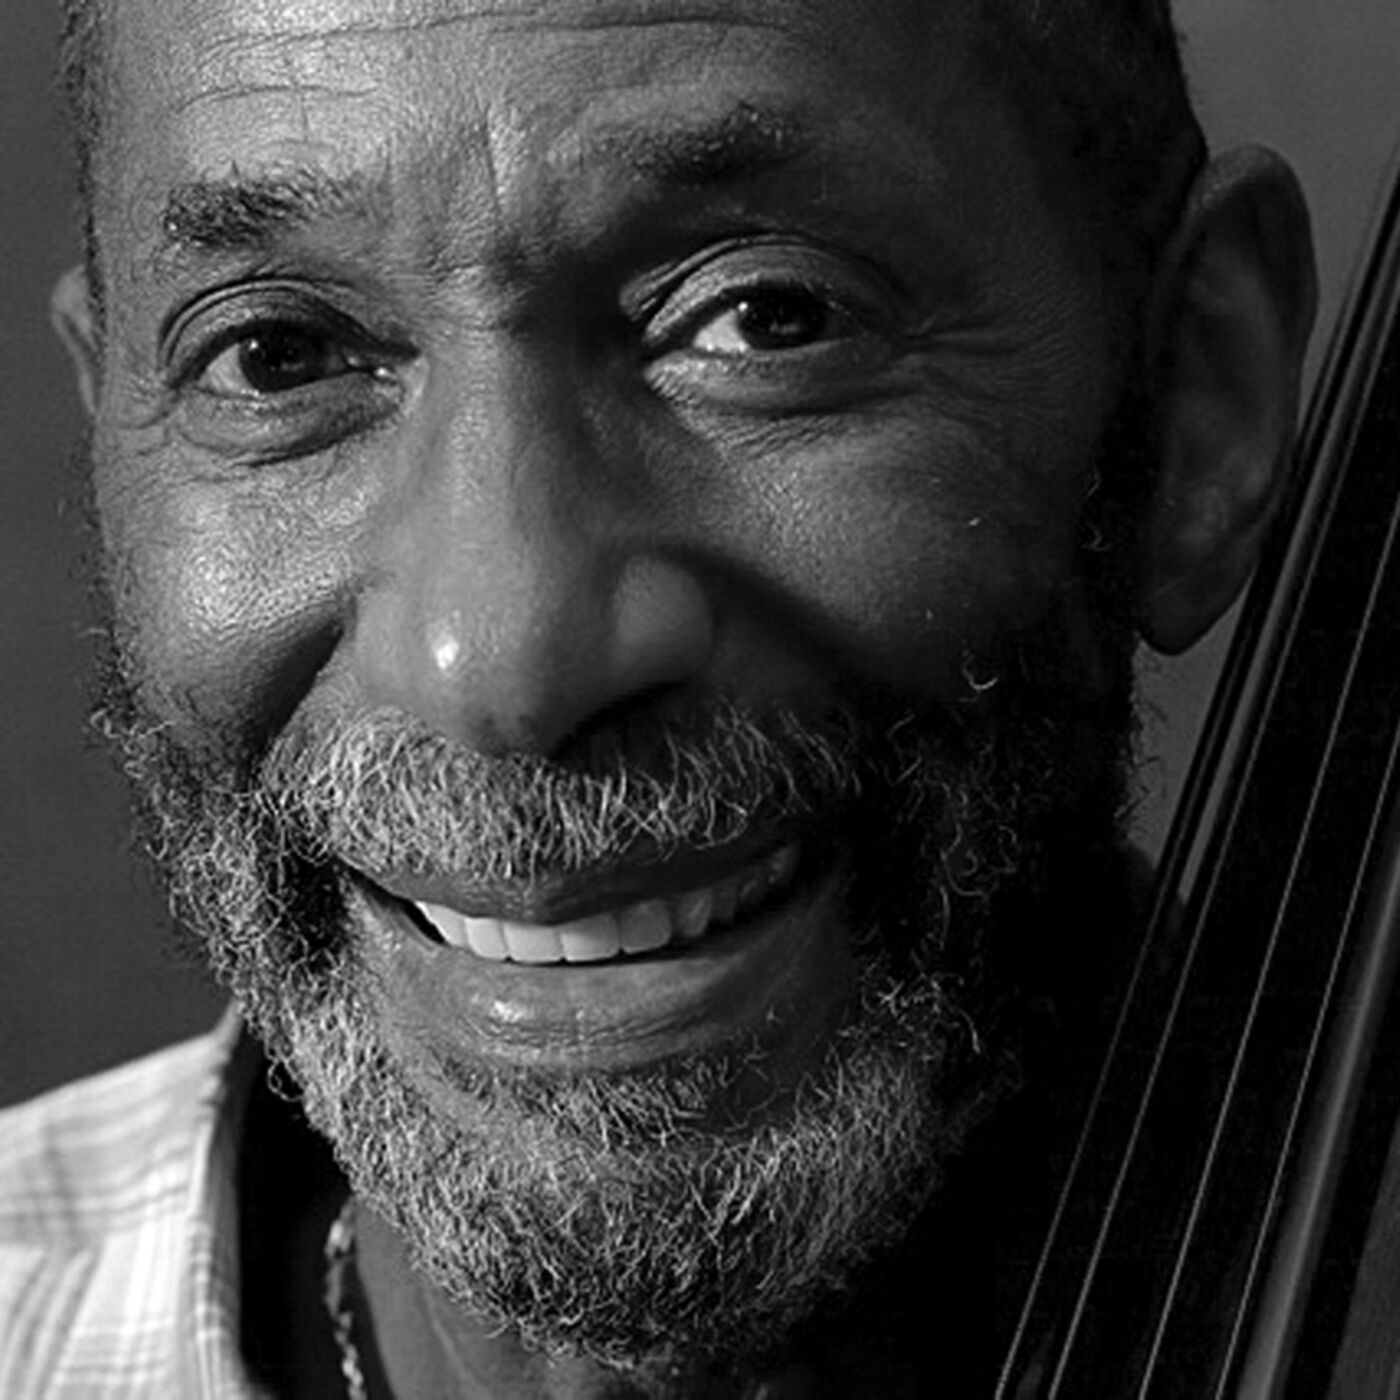 Episode 5 - A conversation with esteemed bassist Ron Carter